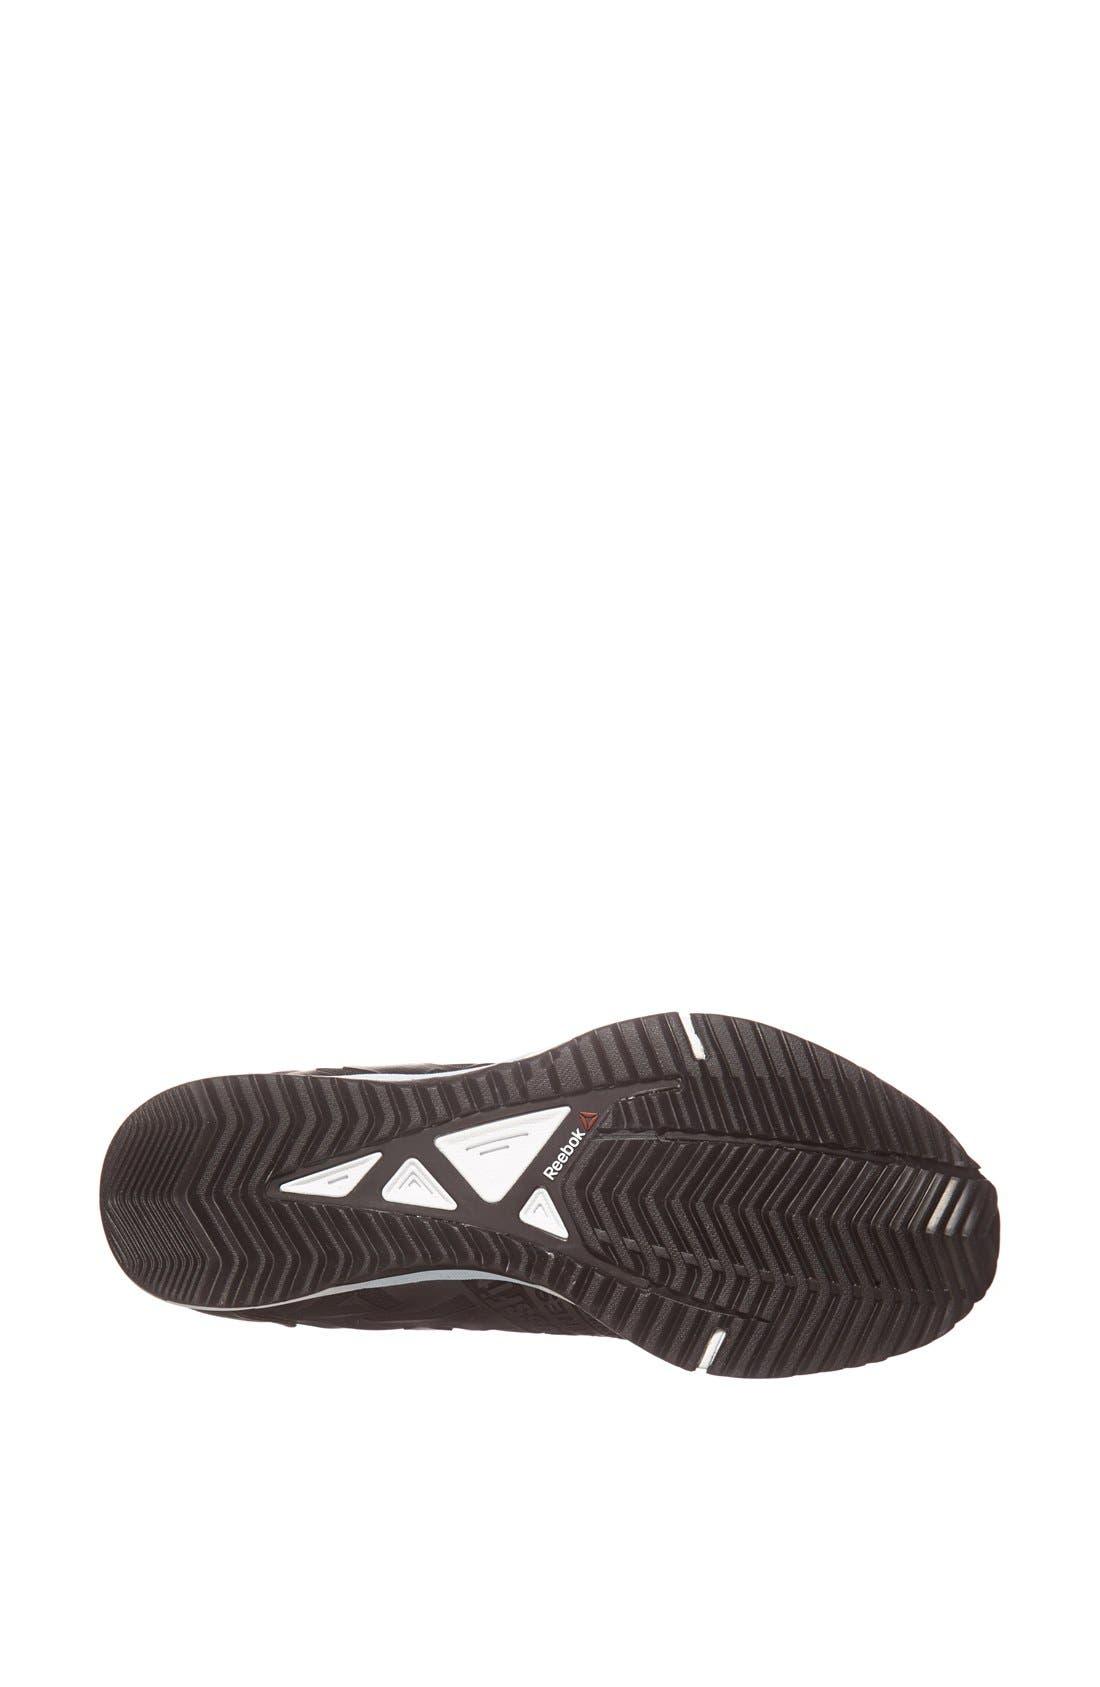 Alternate Image 4  - Reebok 'Crossfit Sprint' Training Shoe (Women)